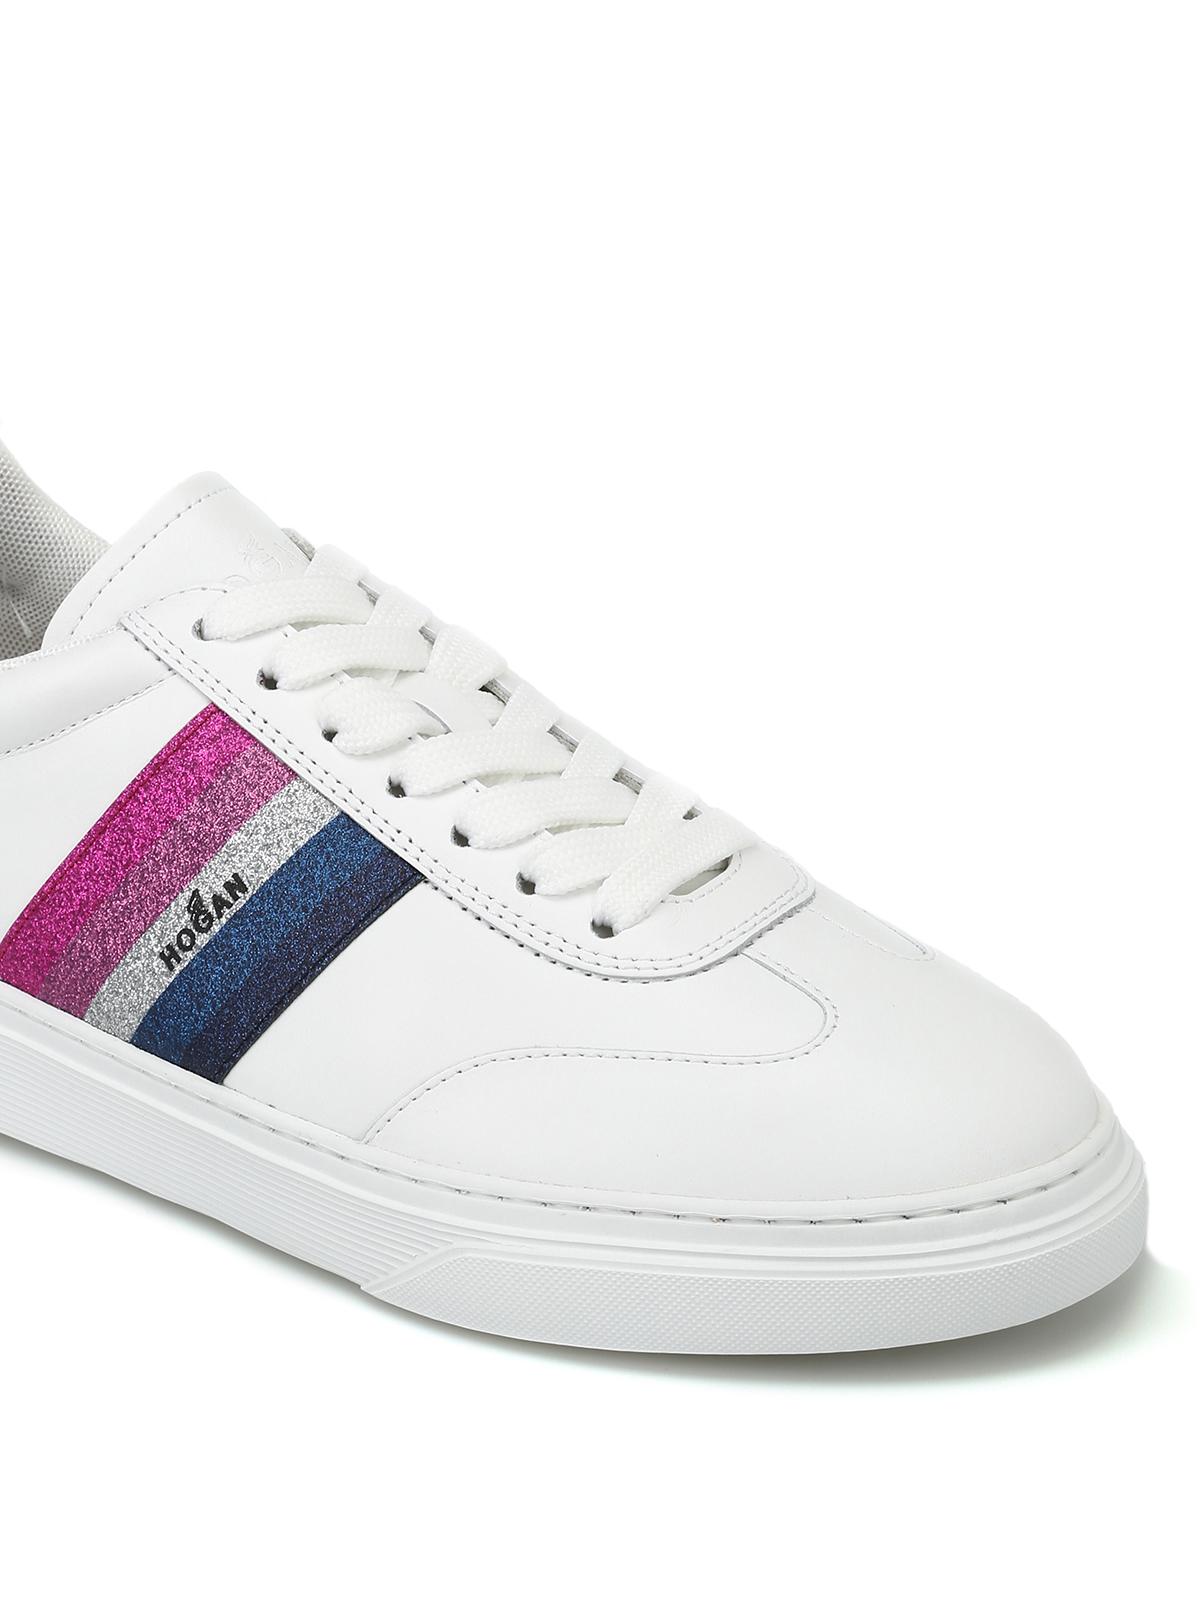 Trainers Hogan - H365 glitter logo band white sneakers ...